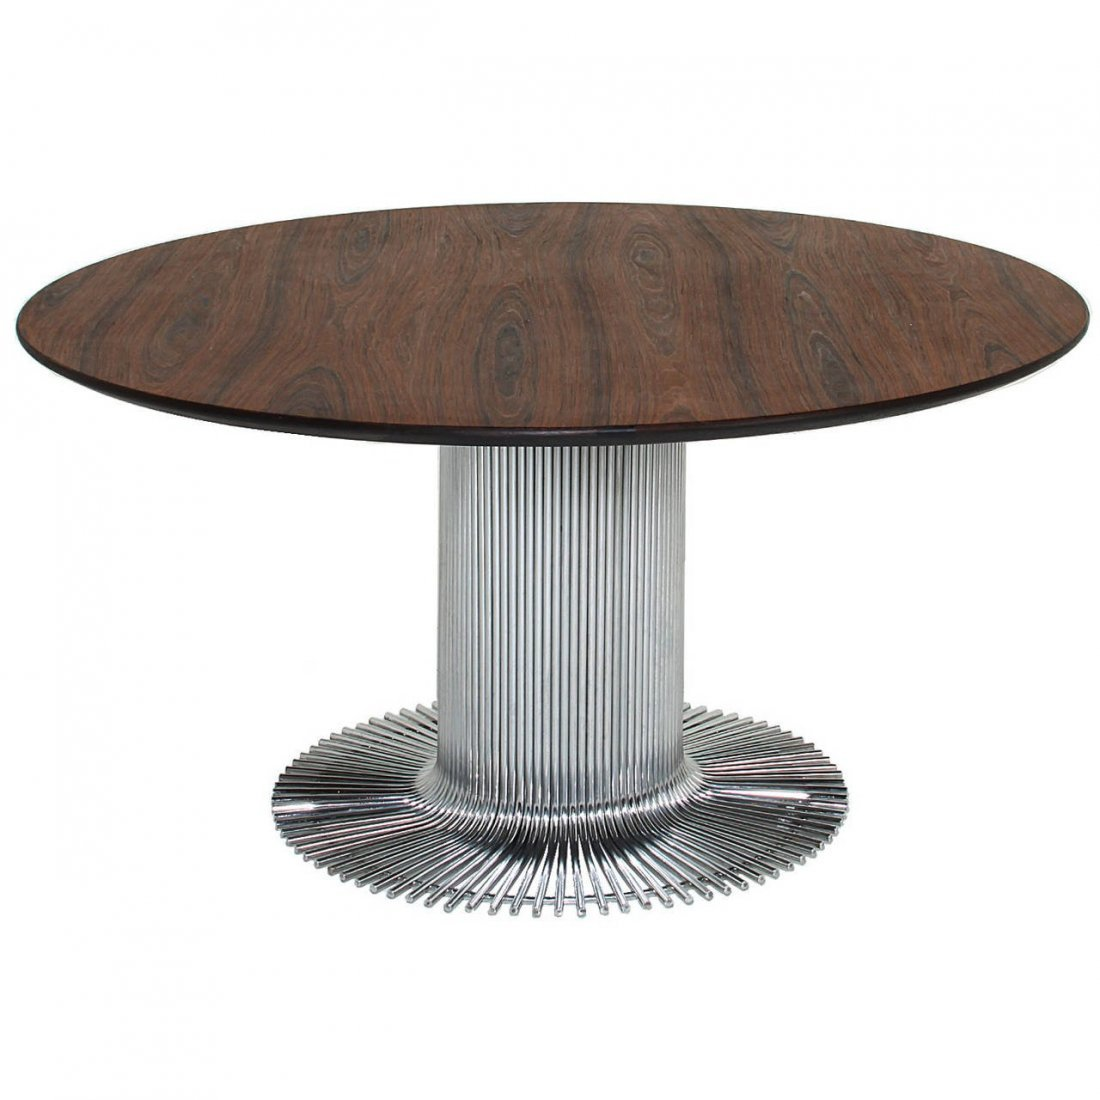 Brazilian Rosewood Table